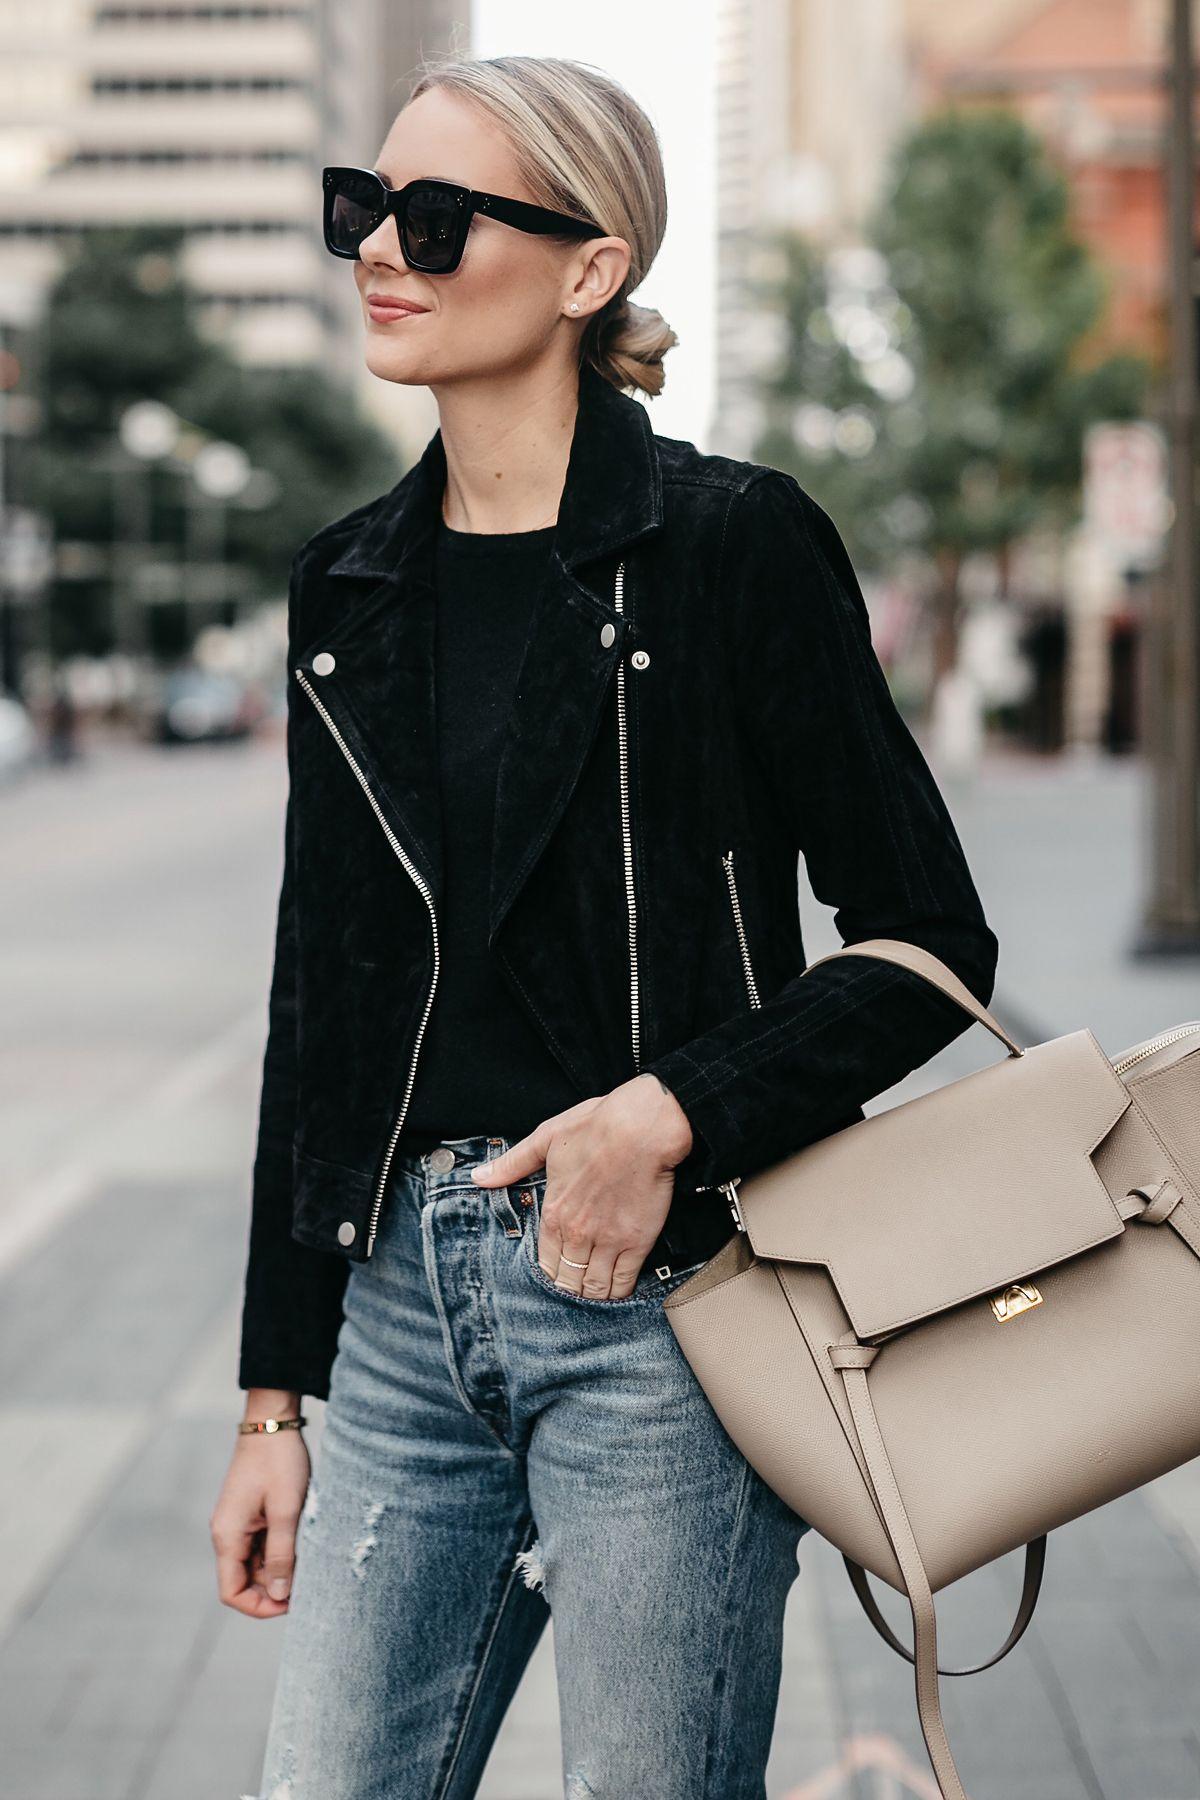 1ac86e7bcd0a Blonde Woman Wearing Black Suede Moto Jacket Black Sweater Denim Ripped  Jeans Celine Mini Belt Bag Fall-Fashion Must Haves Fashion Jackson Dallas  Blogger ...